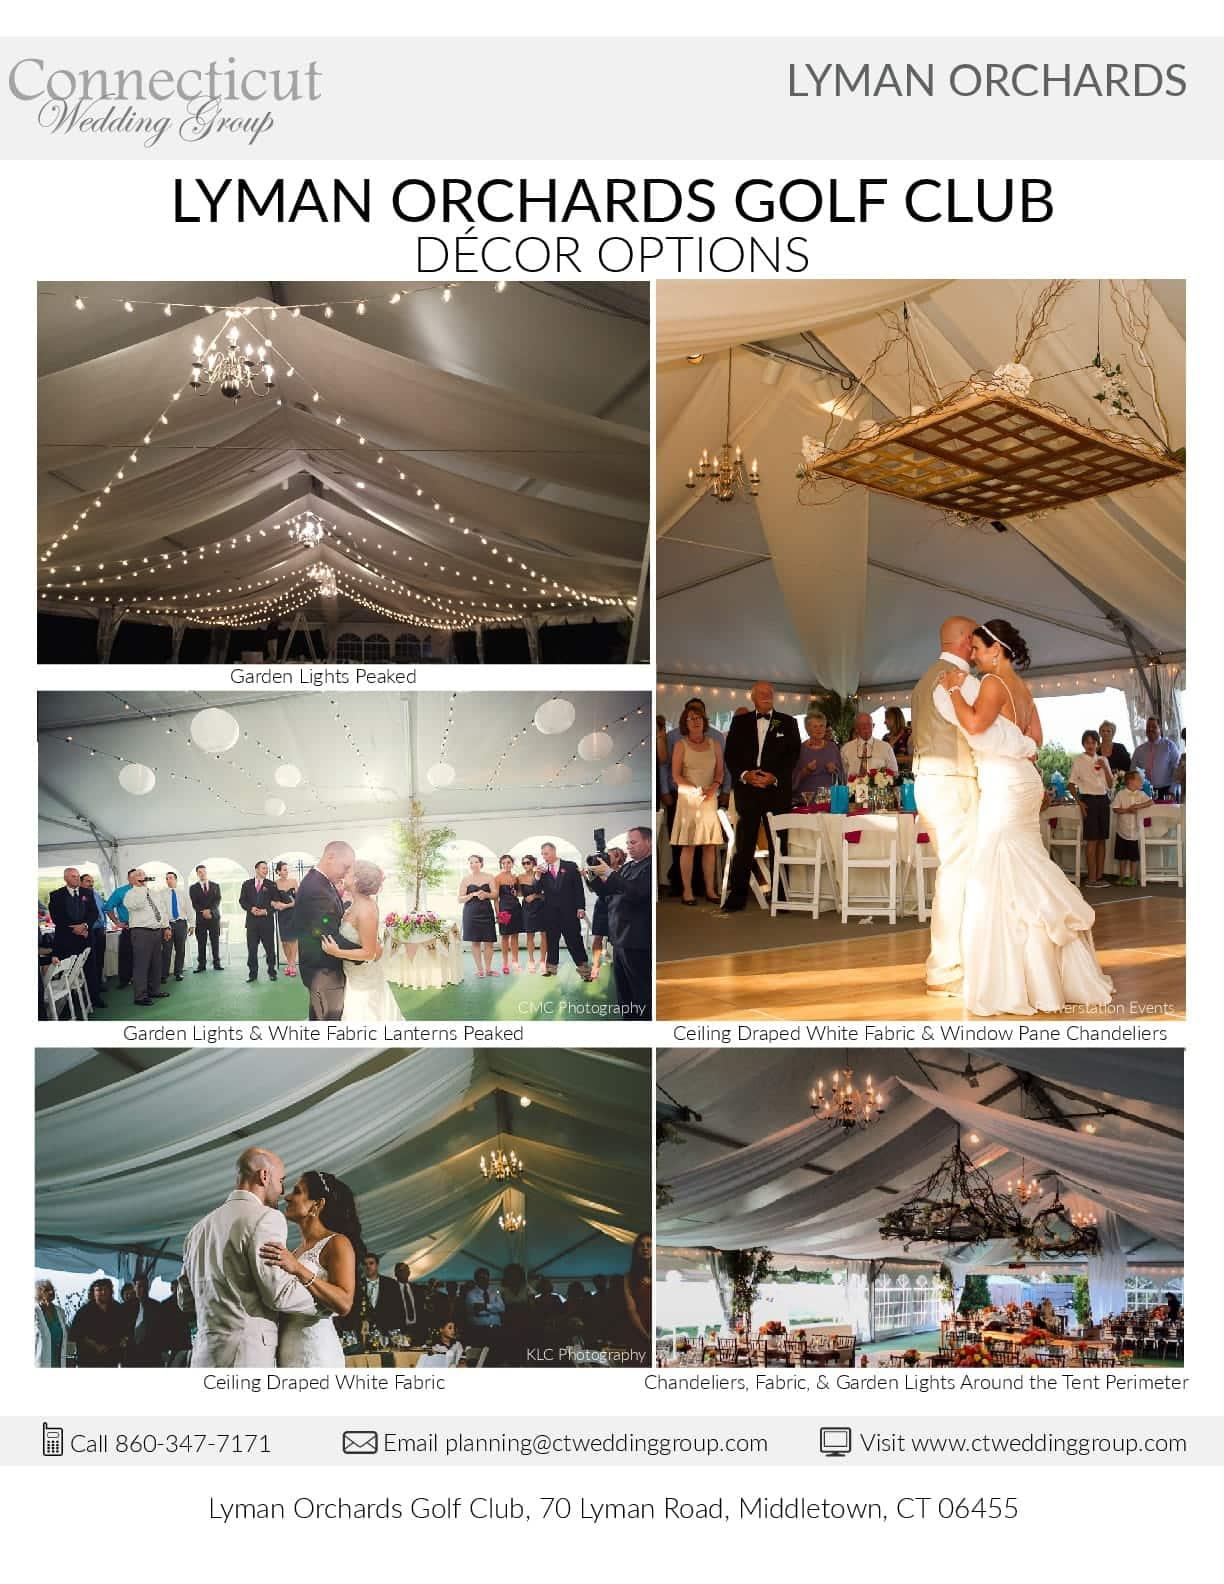 117_15314_Lyman-Orchards-Golf-Club-Decor-Package_2017-001-min